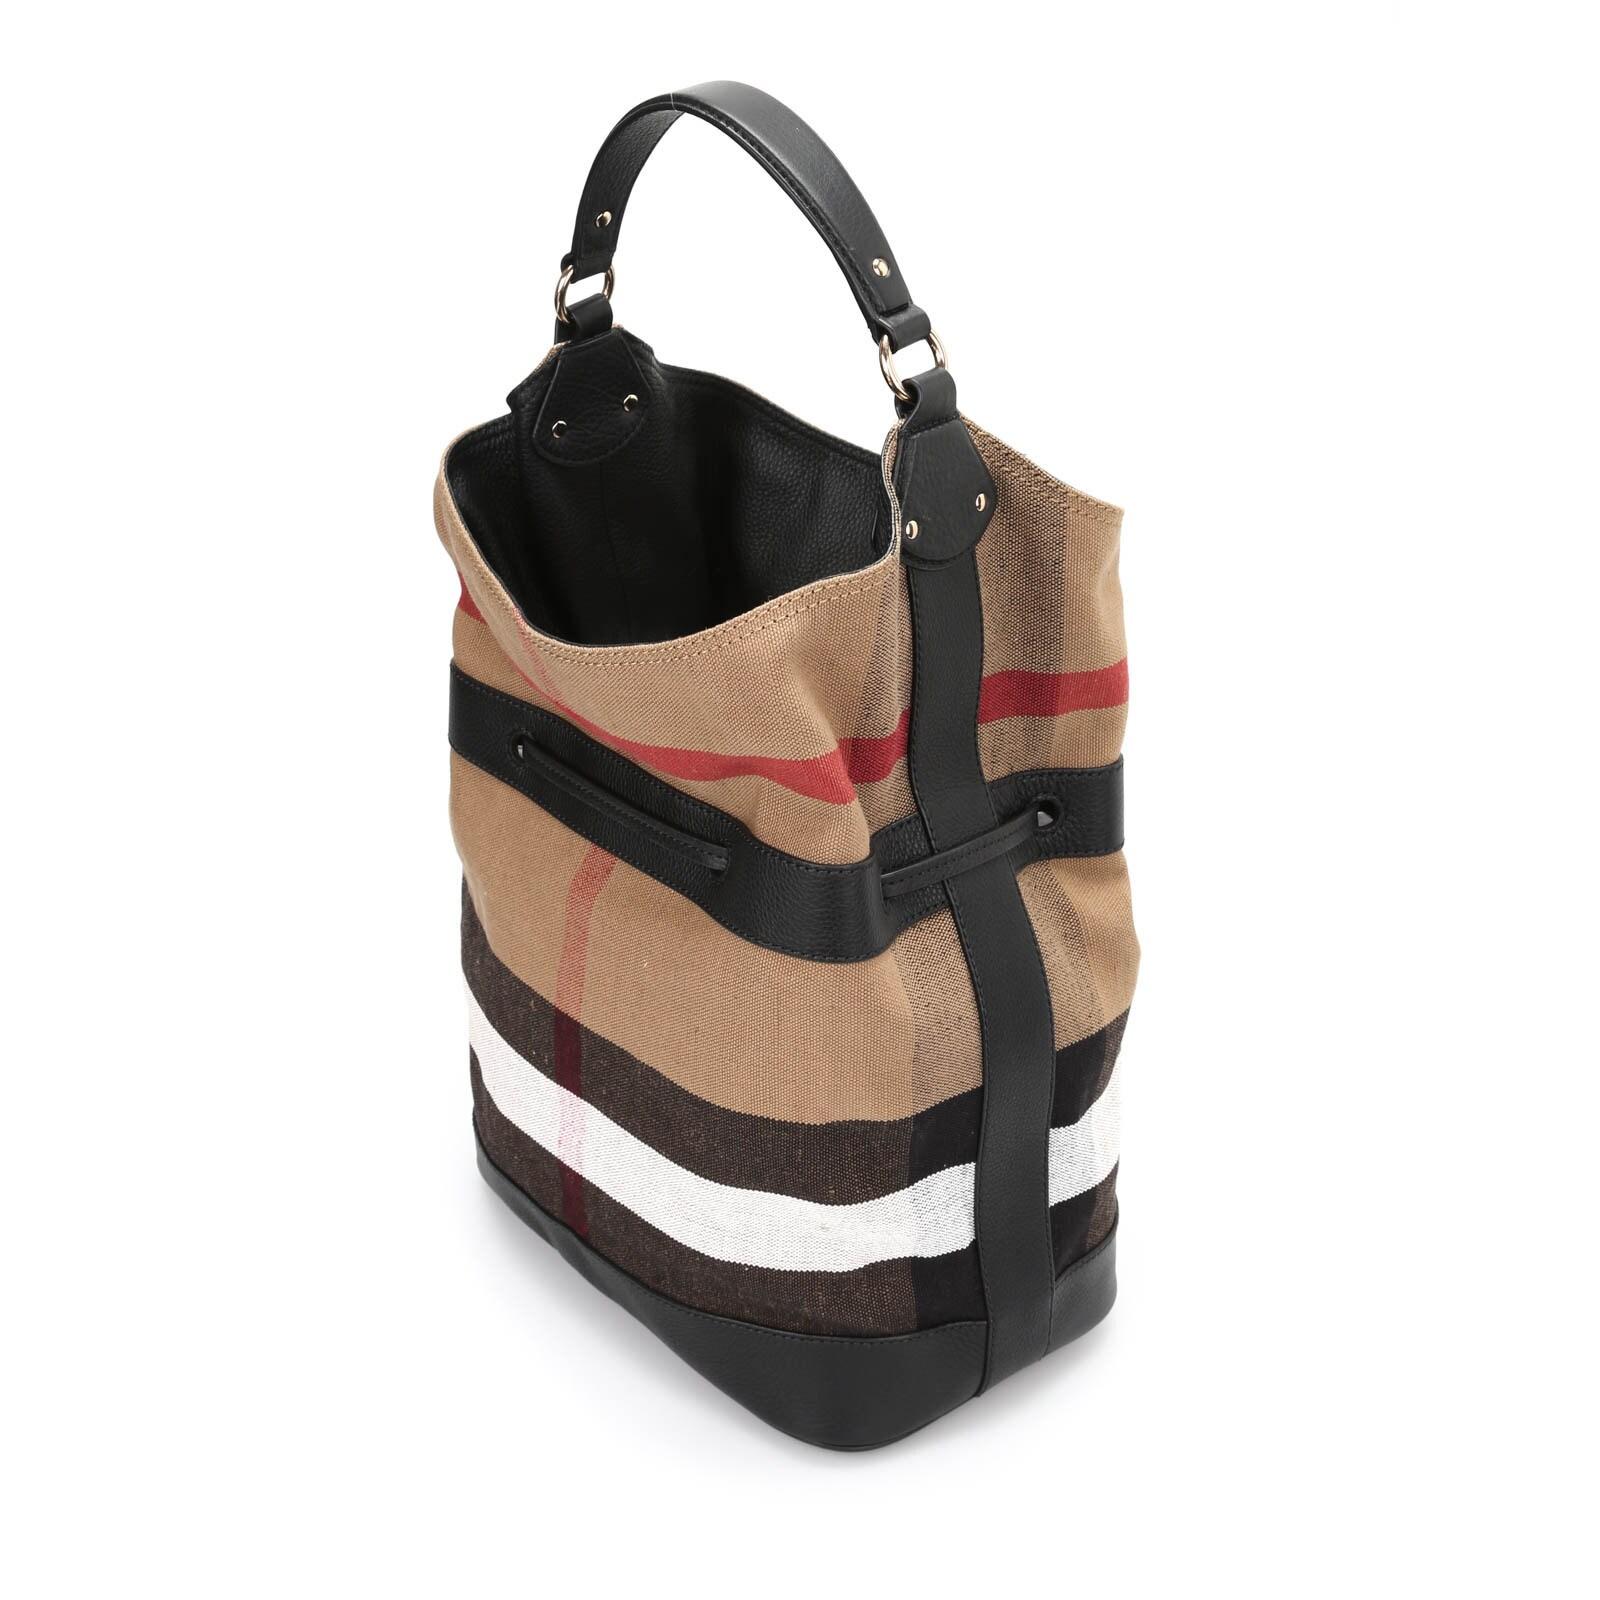 bb8ea9afce Shop Burberry Susanna Beige Check Bucket Bag - Ships To Canada - Overstock  - 14155106